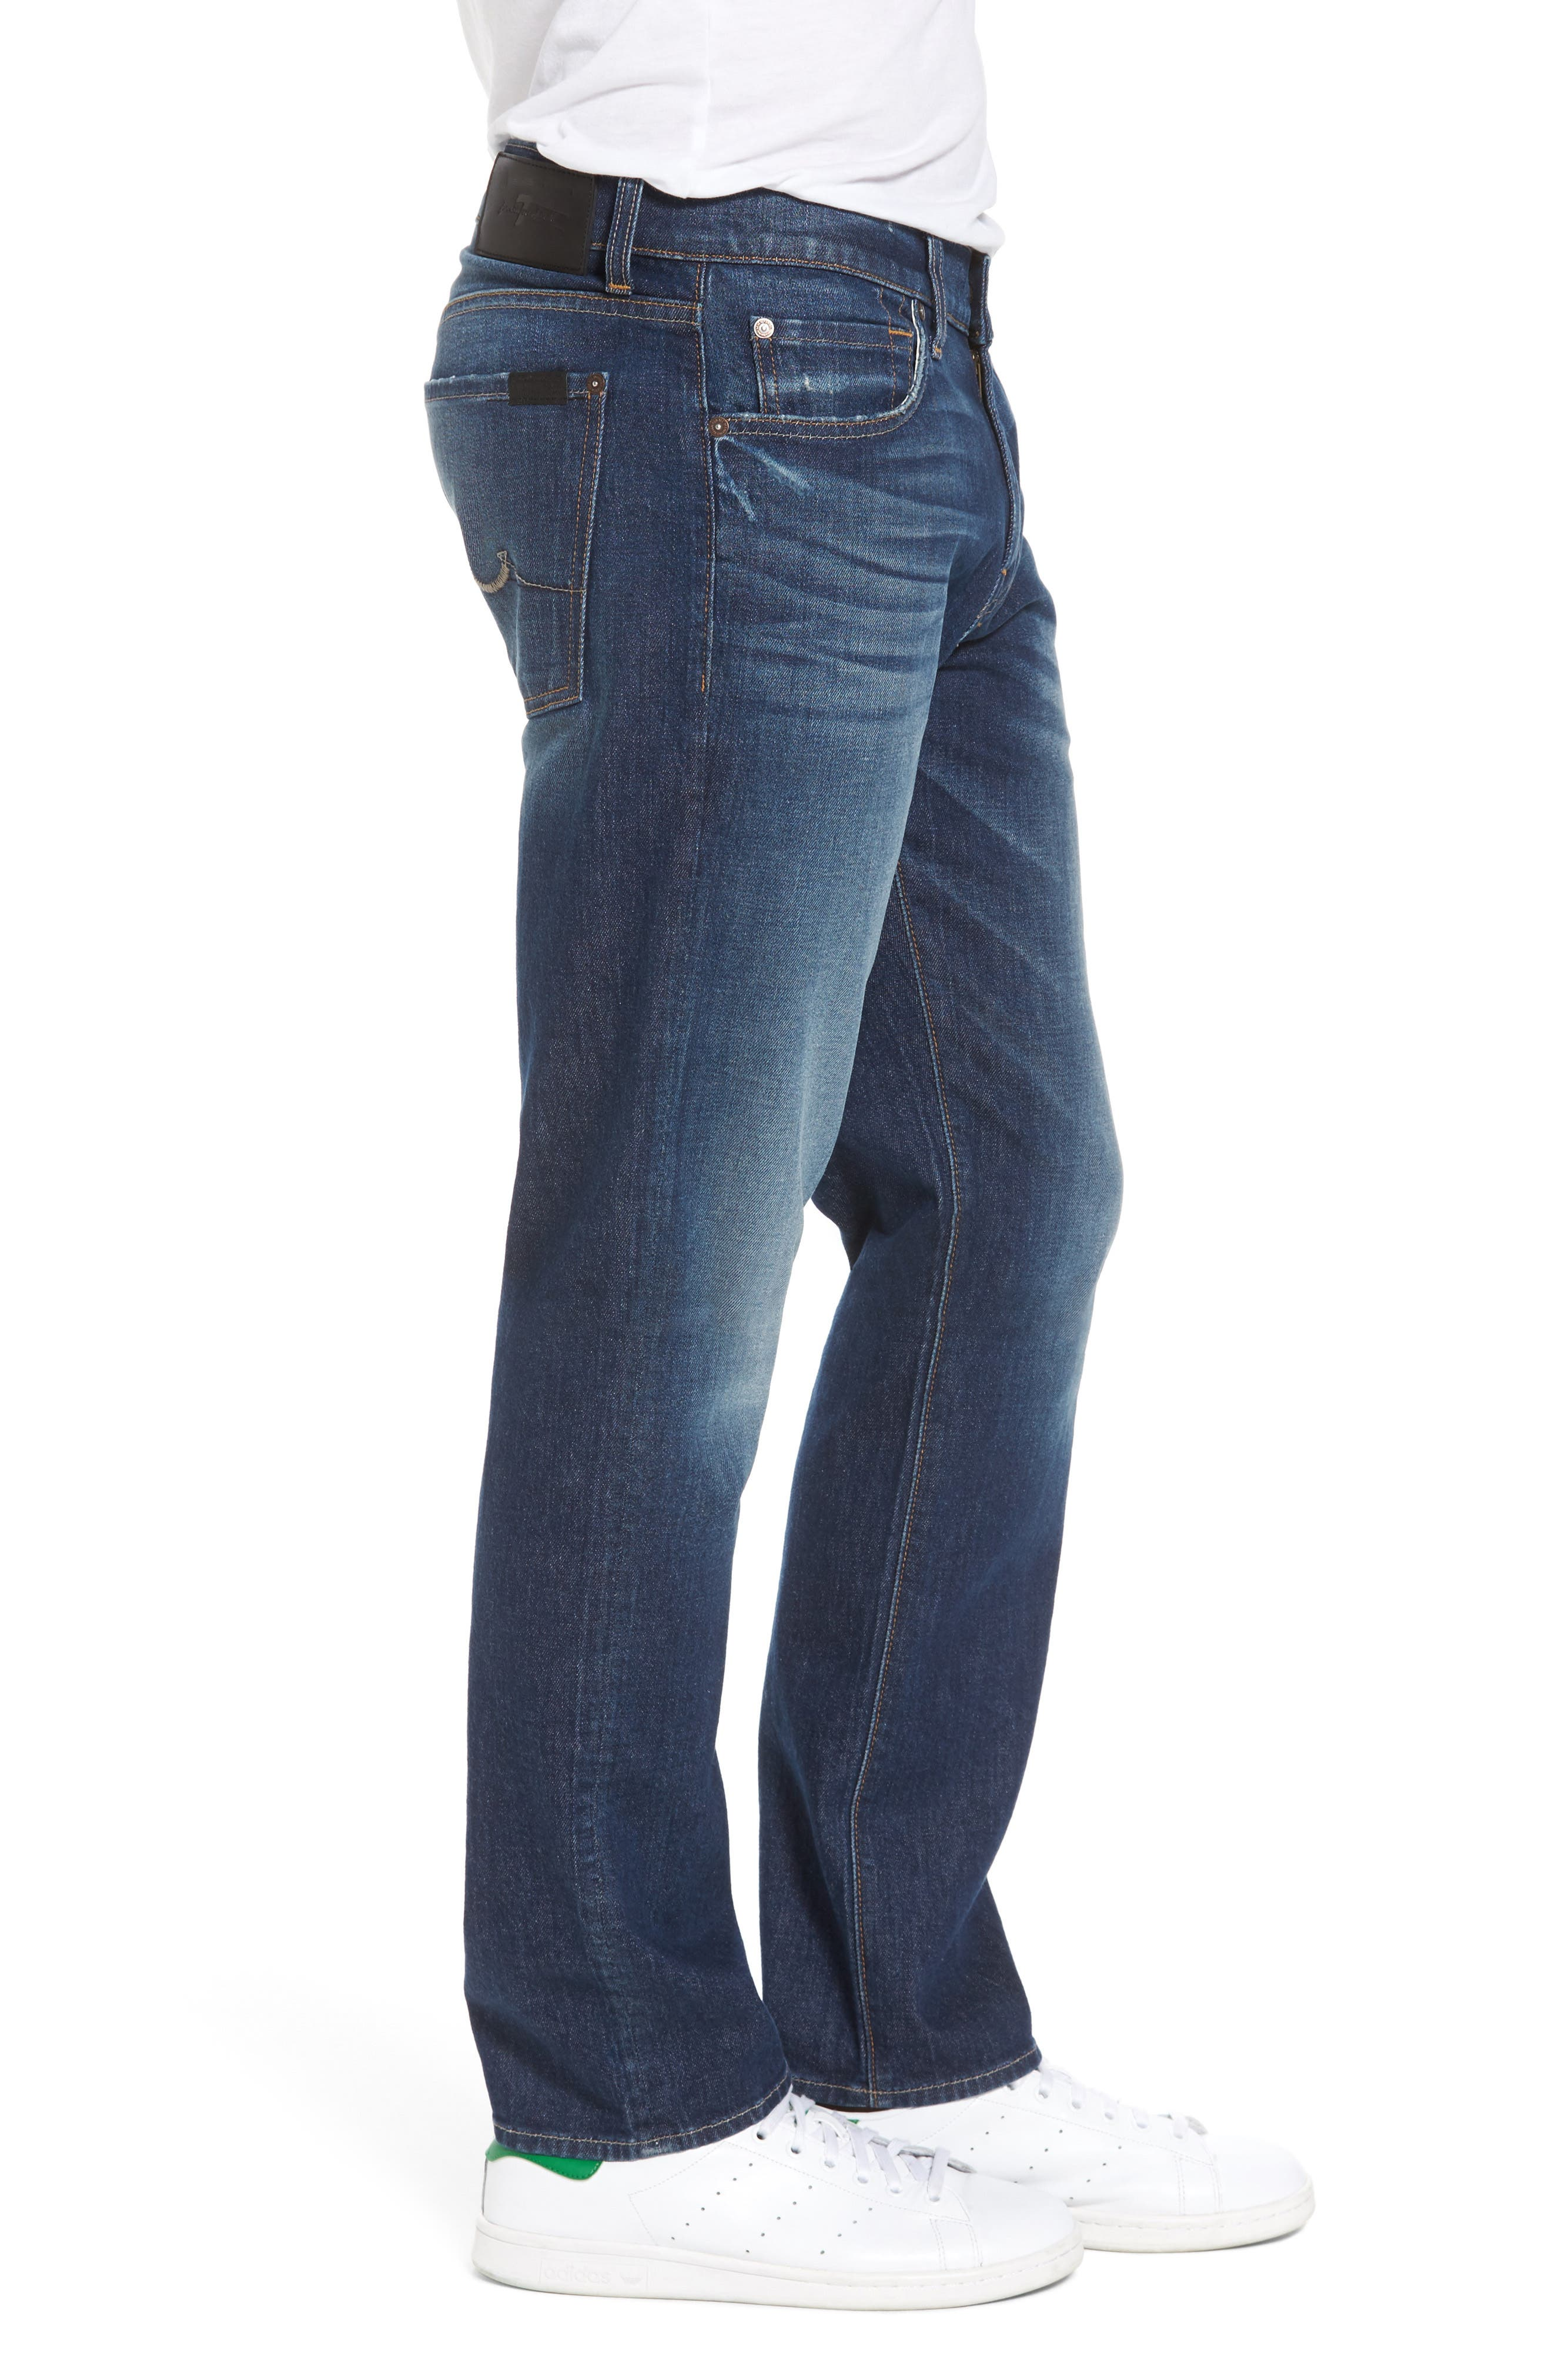 Alternate Image 3  - 7 For All Mankind® Slimmy Slim Fit Jeans (Venture)